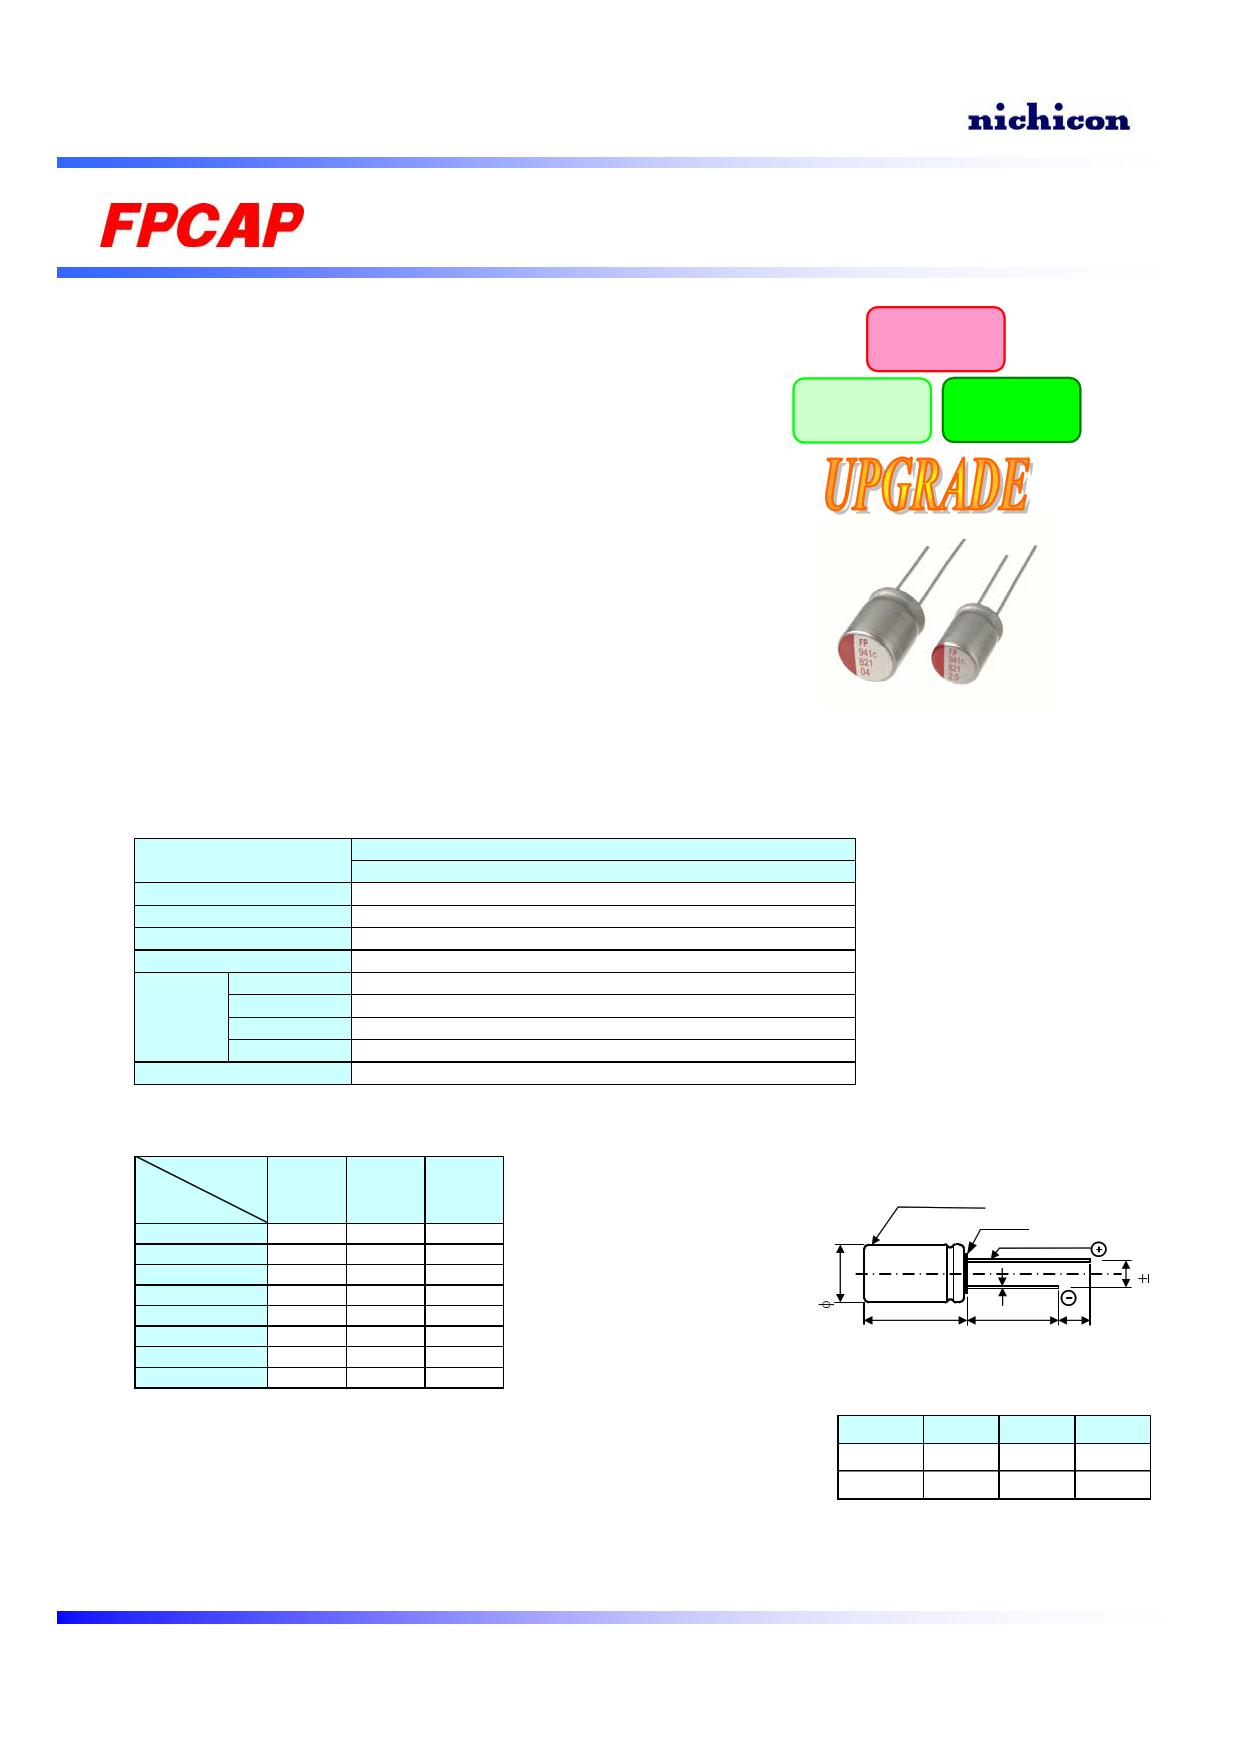 RR50J821MDN1PH 데이터시트 및 RR50J821MDN1PH PDF